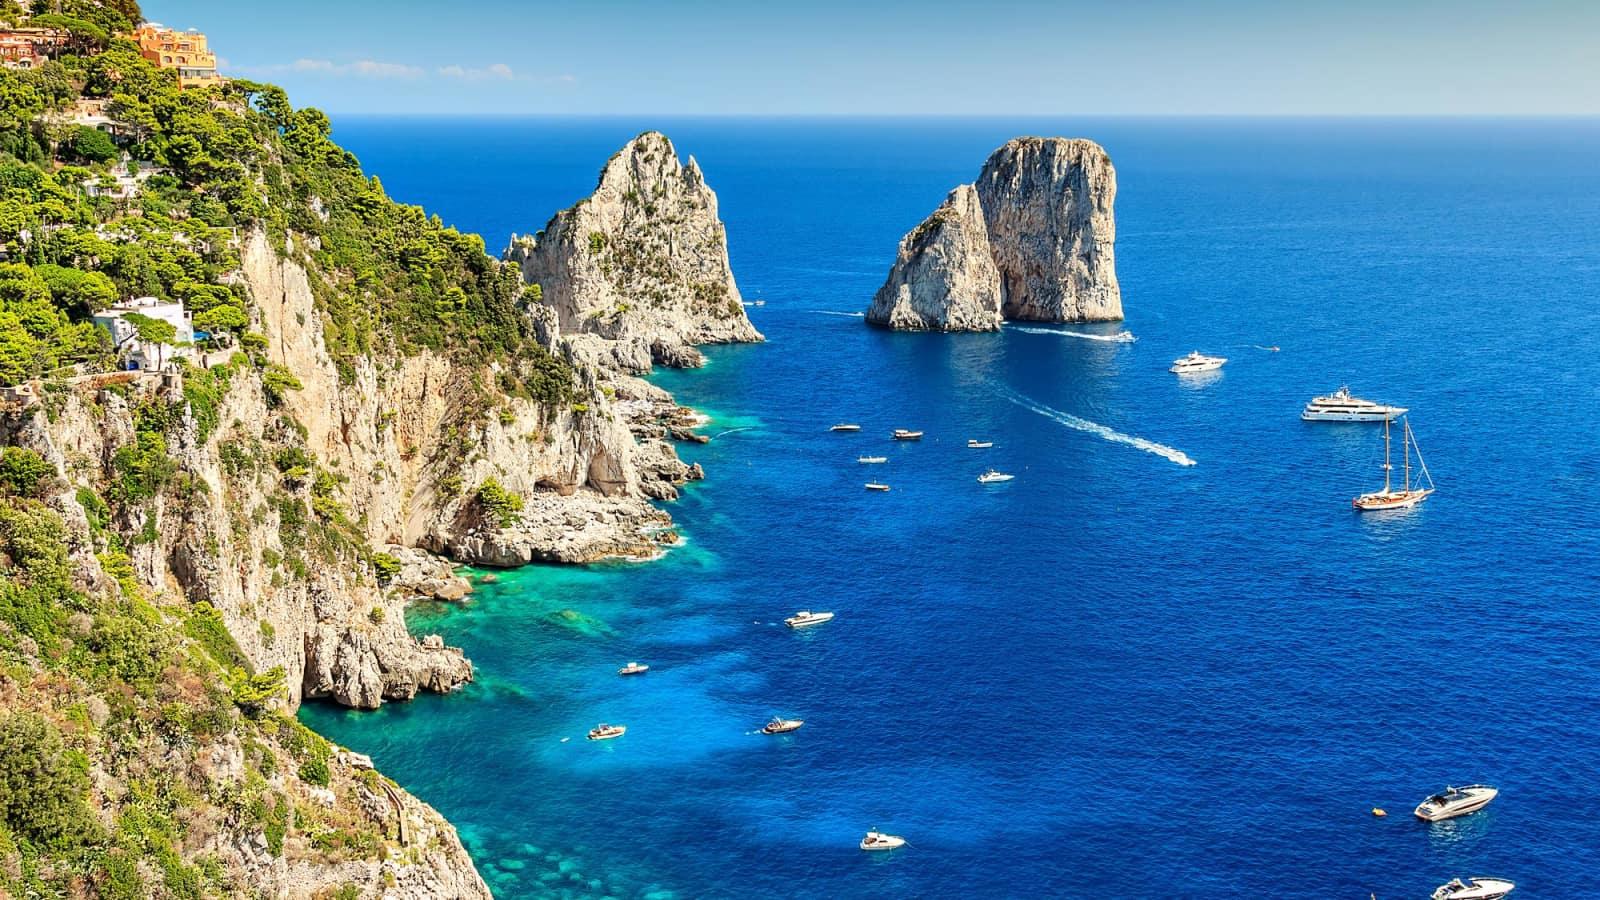 Capri-Italy-travel-41350184-1600-900